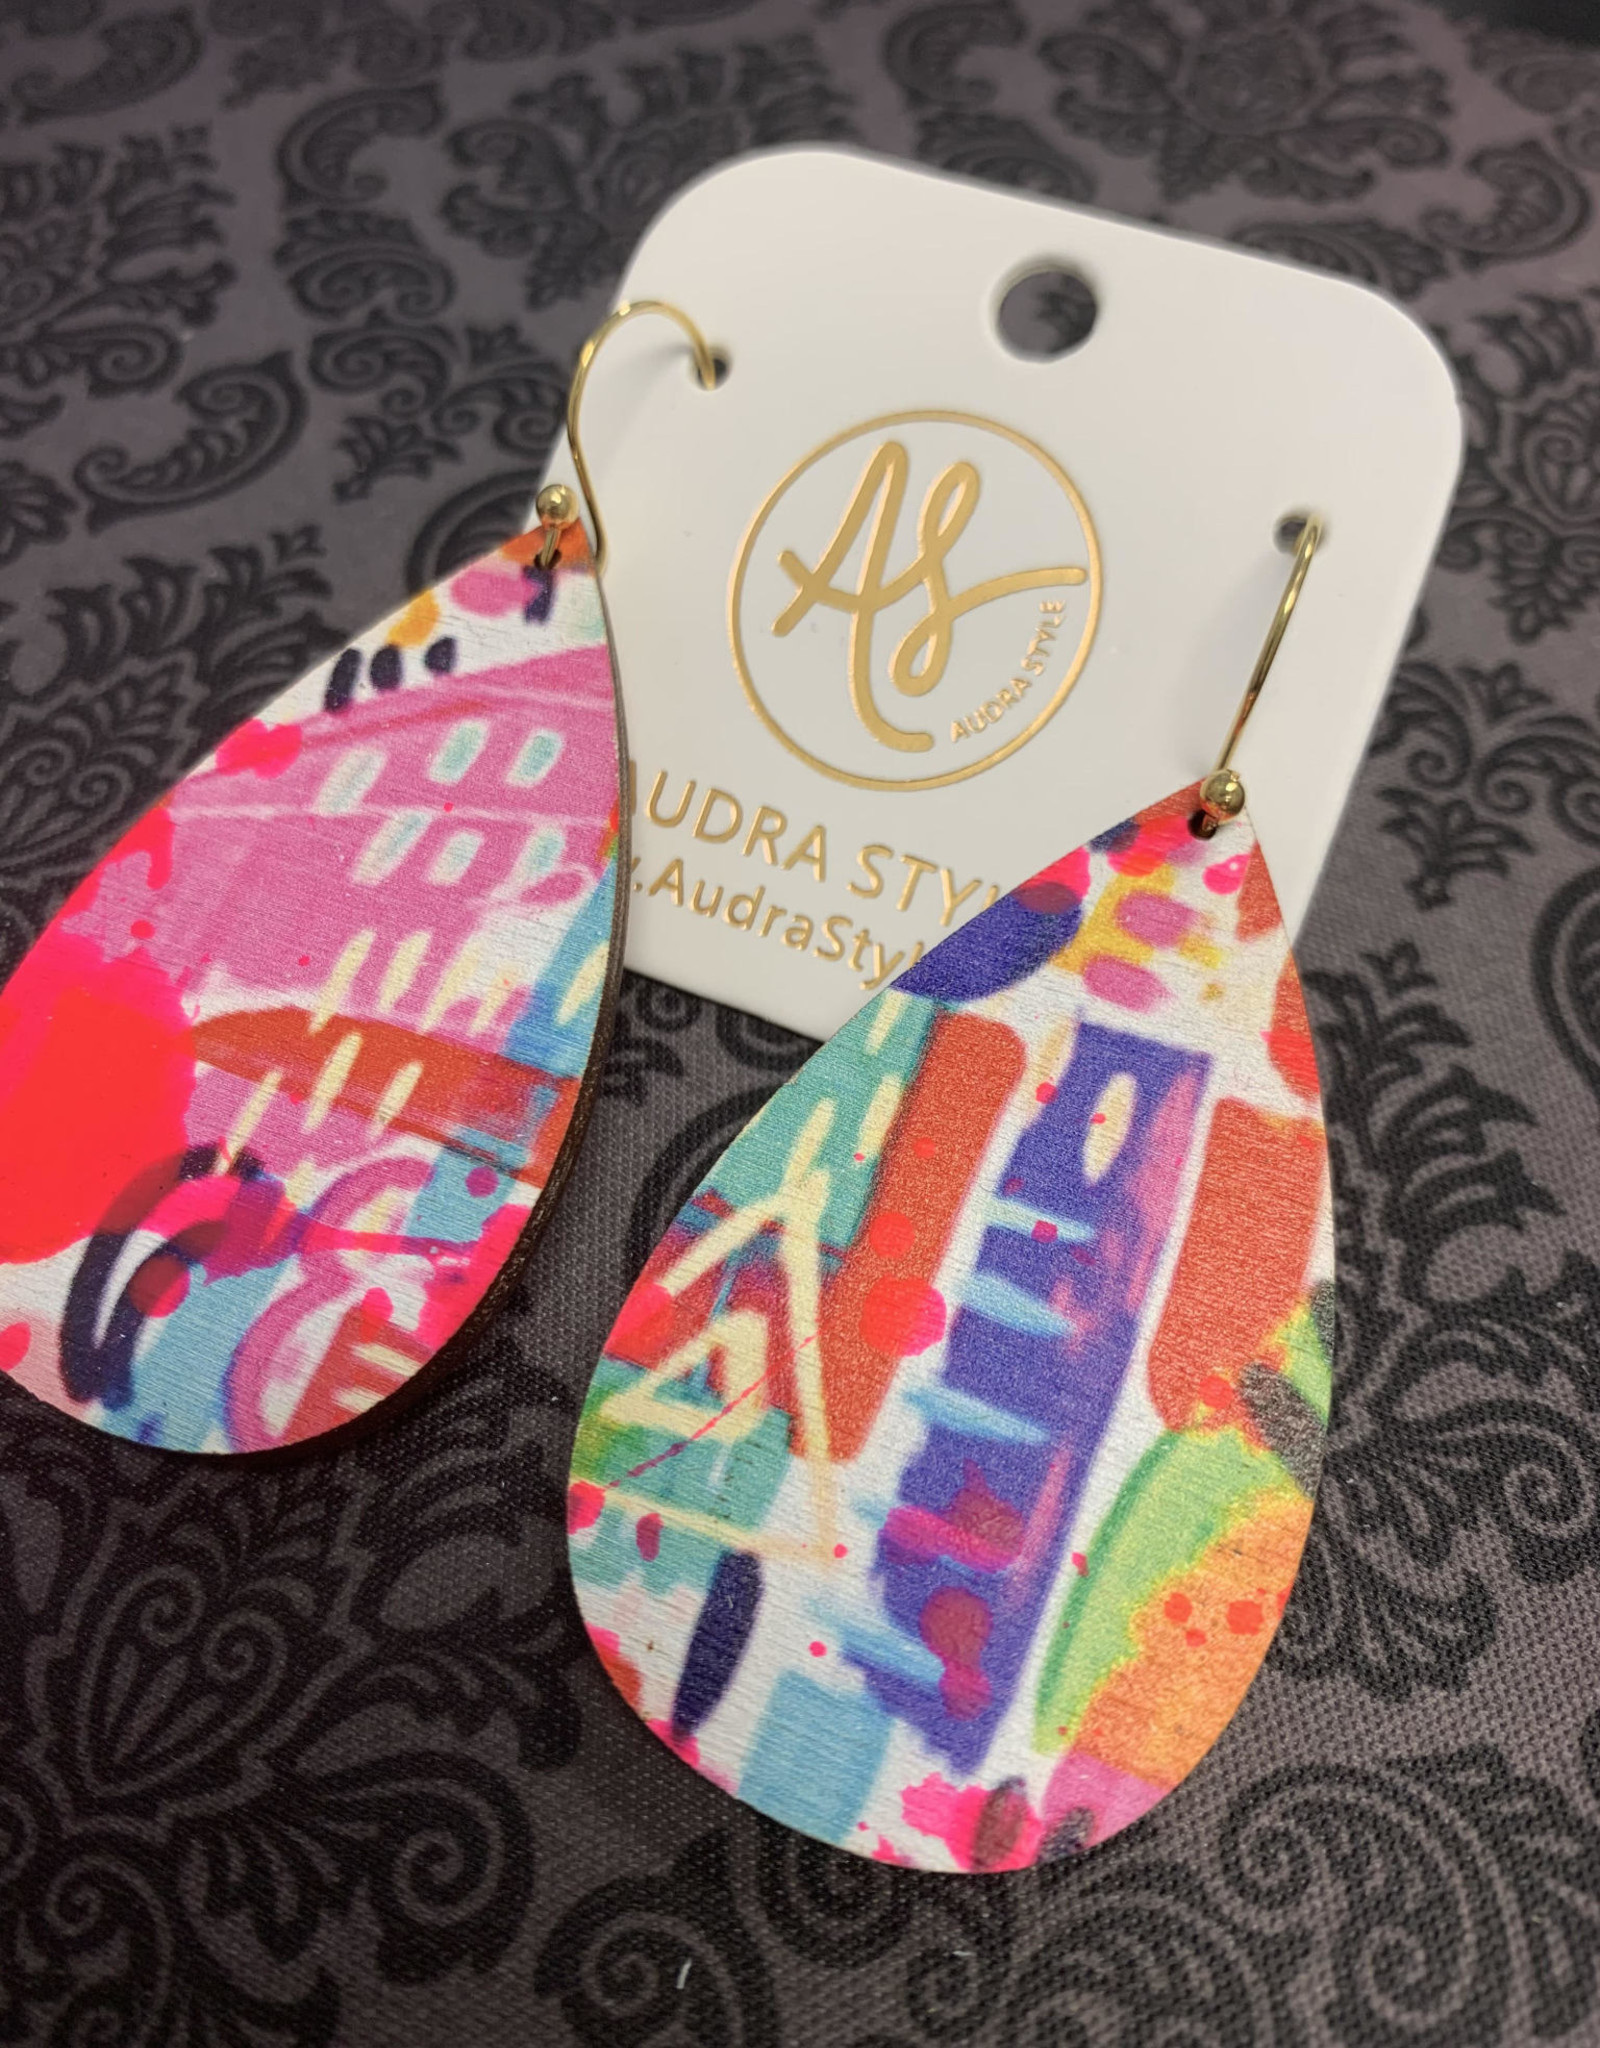 Audra Style Retro Earrings